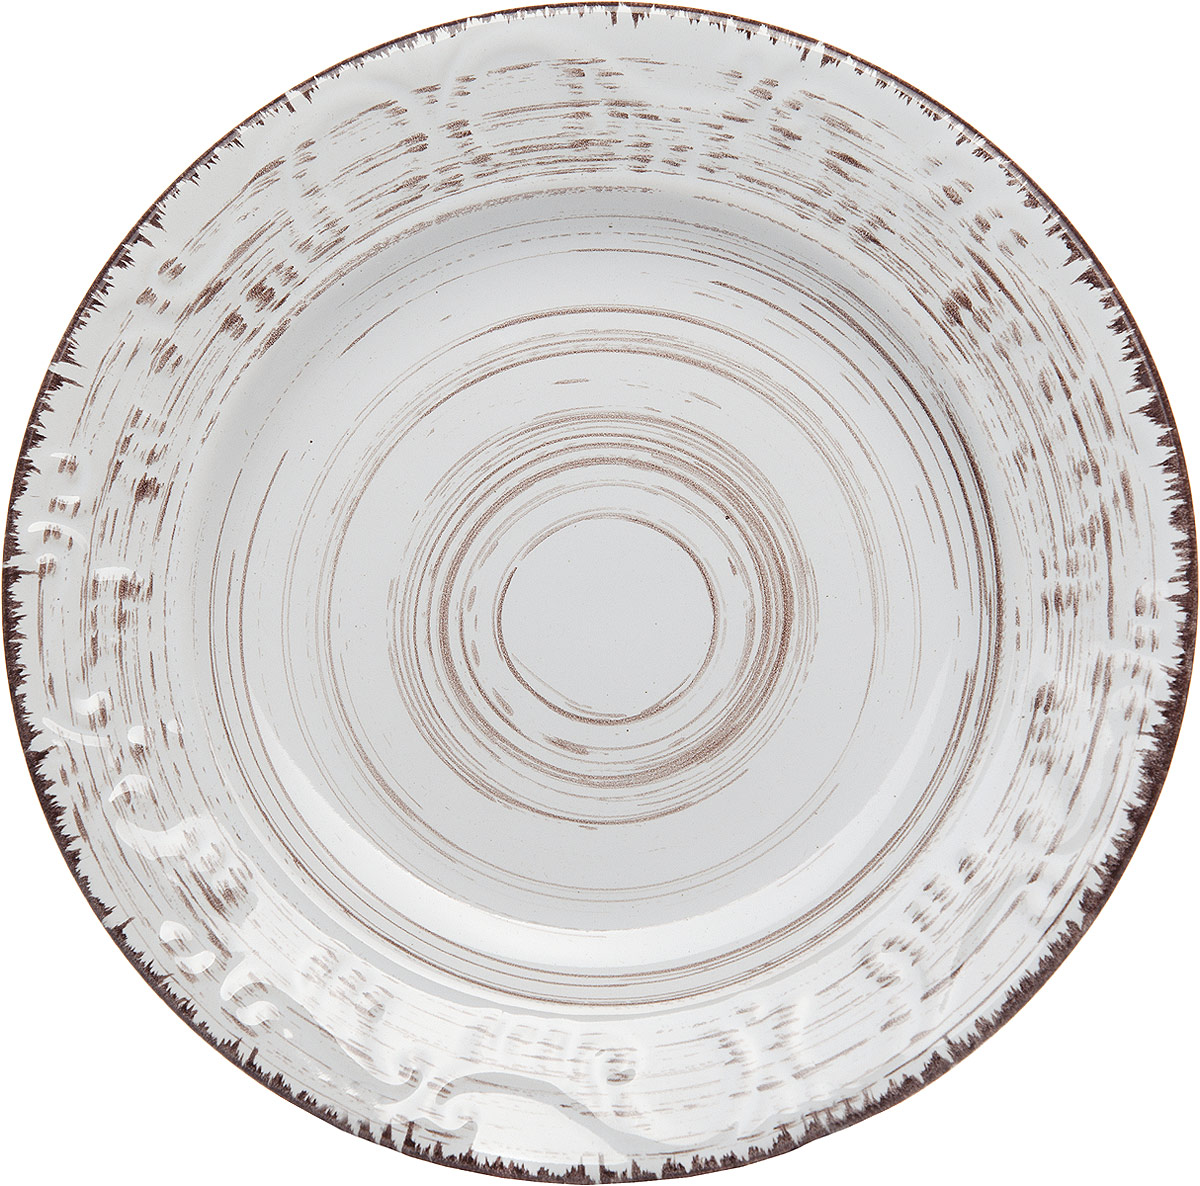 Тарелка Gotoff , цвет: белый, диаметр 20,5 см тарелка gotoff 19 х 19 см wtc 631